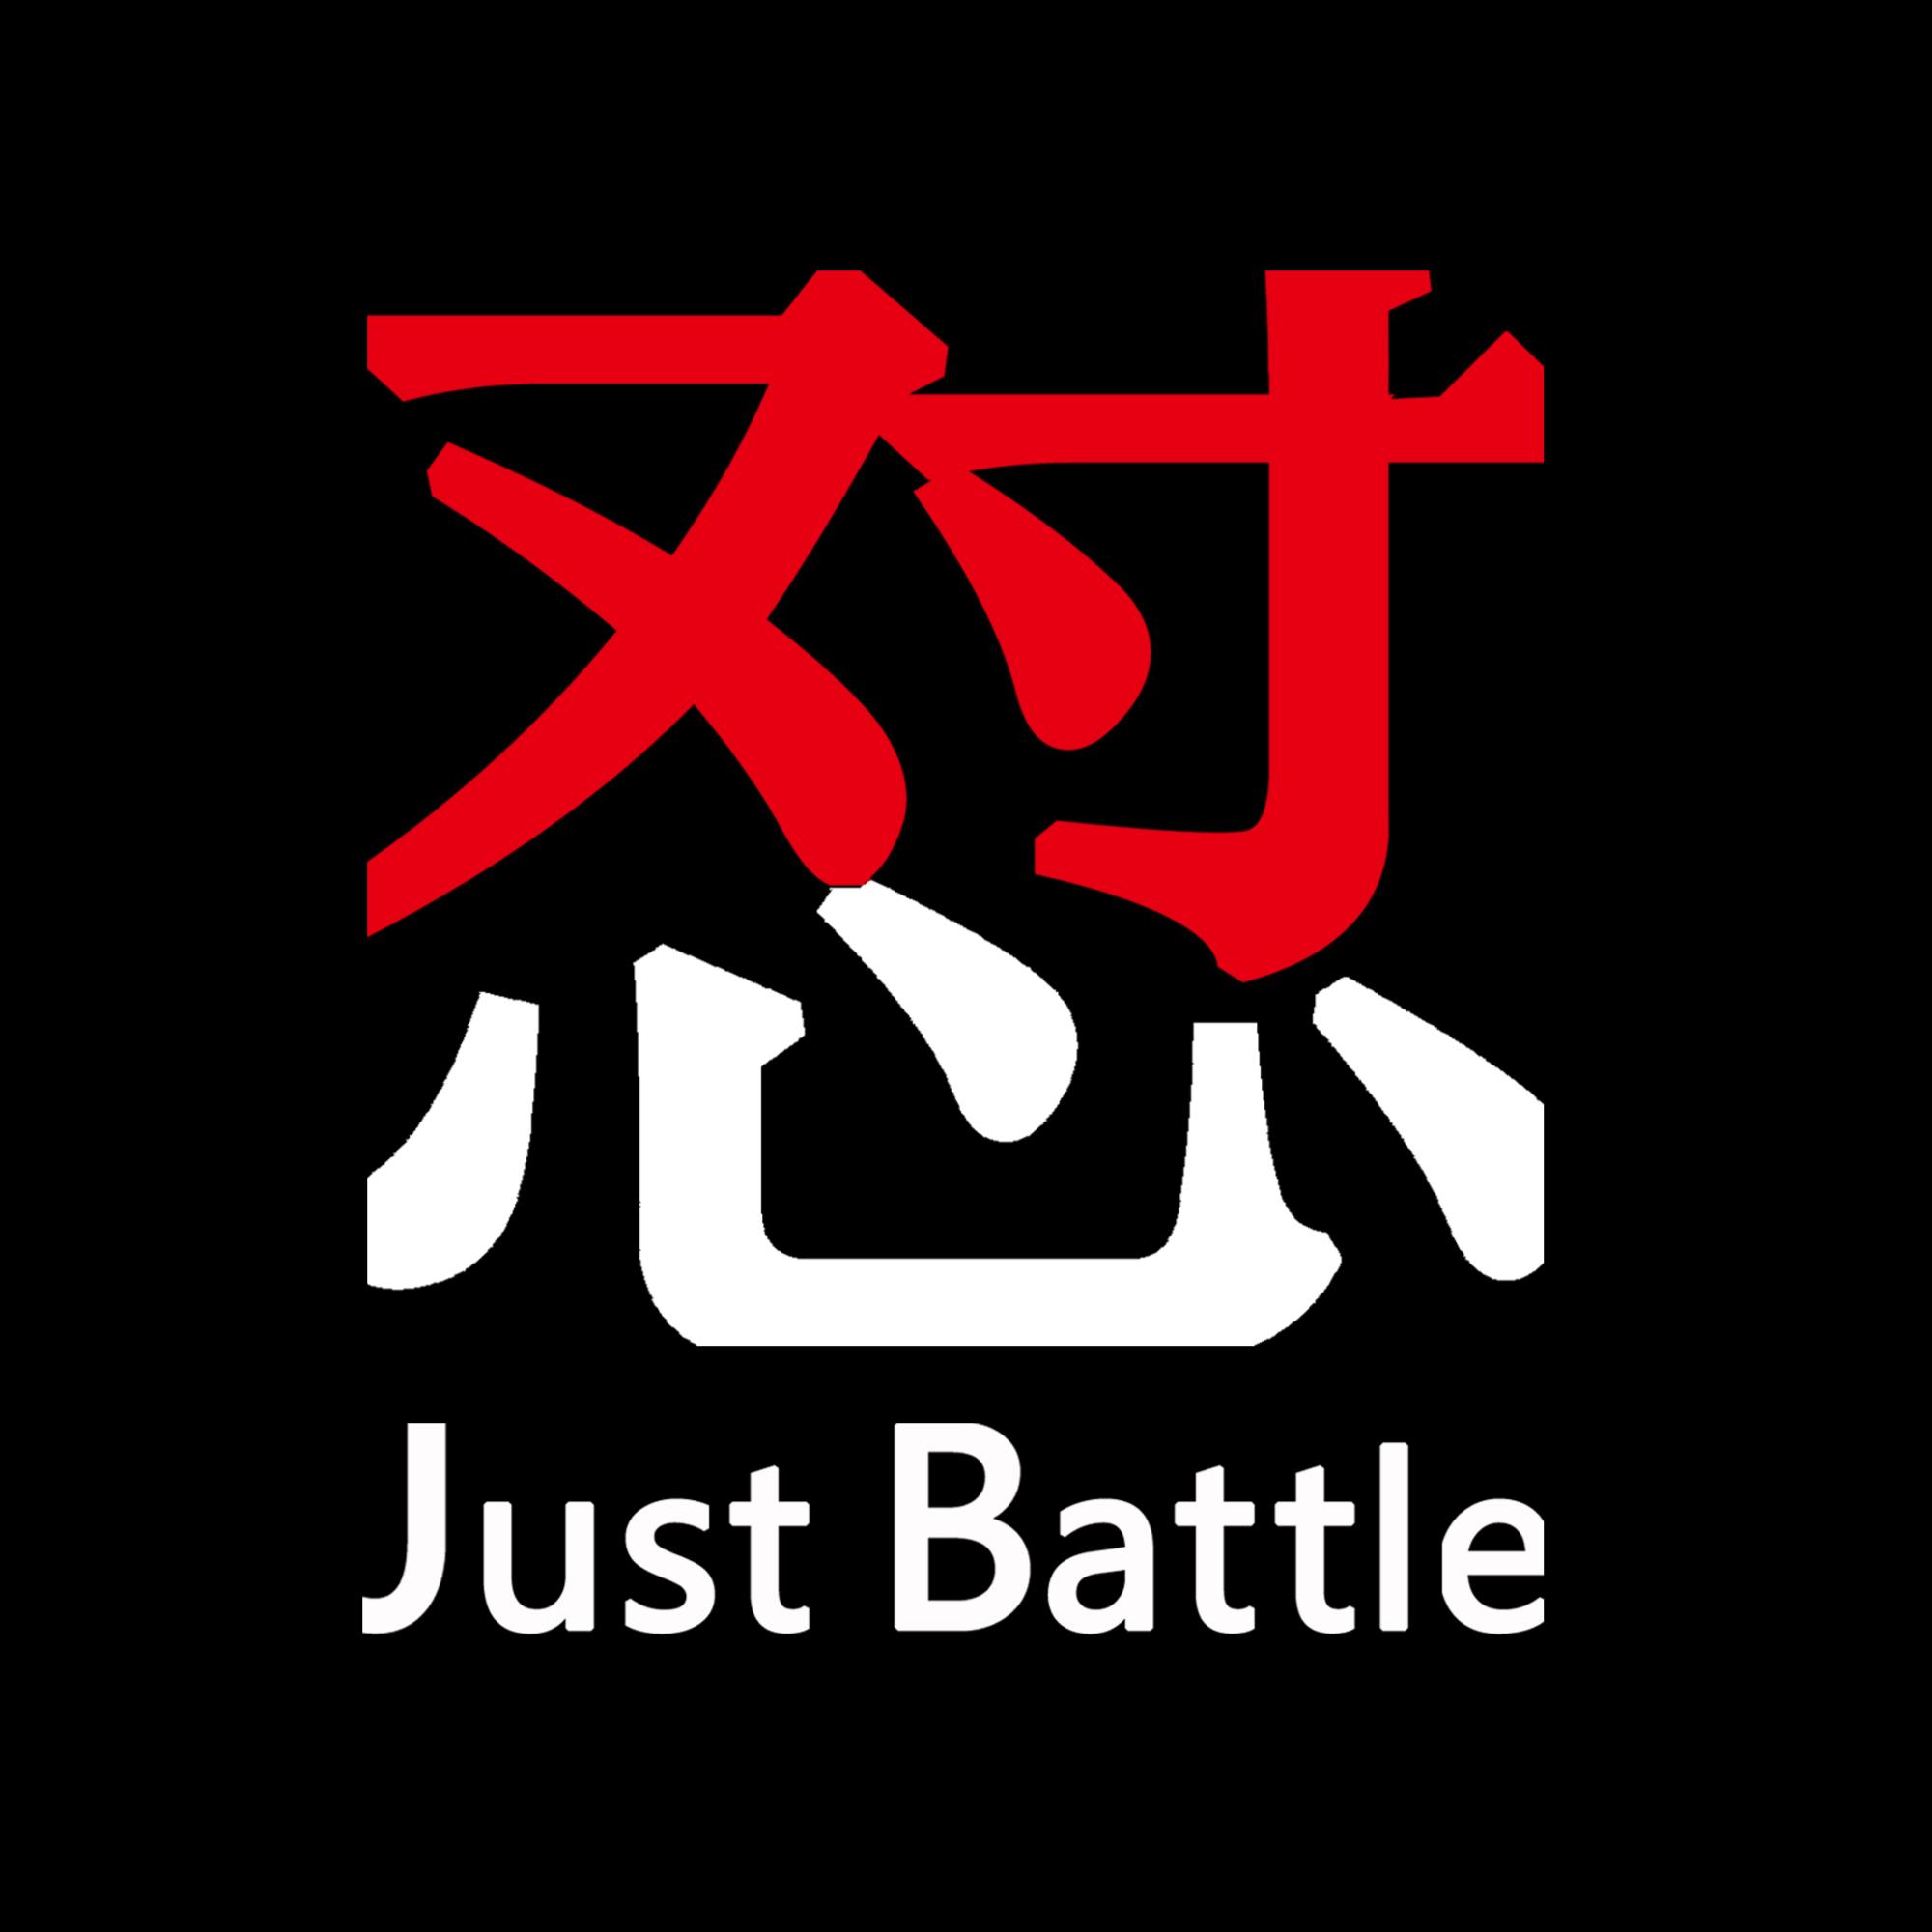 Vol.01 怼!30岁该优先稳定工作还是追求梦想?2-1 | Just Battle